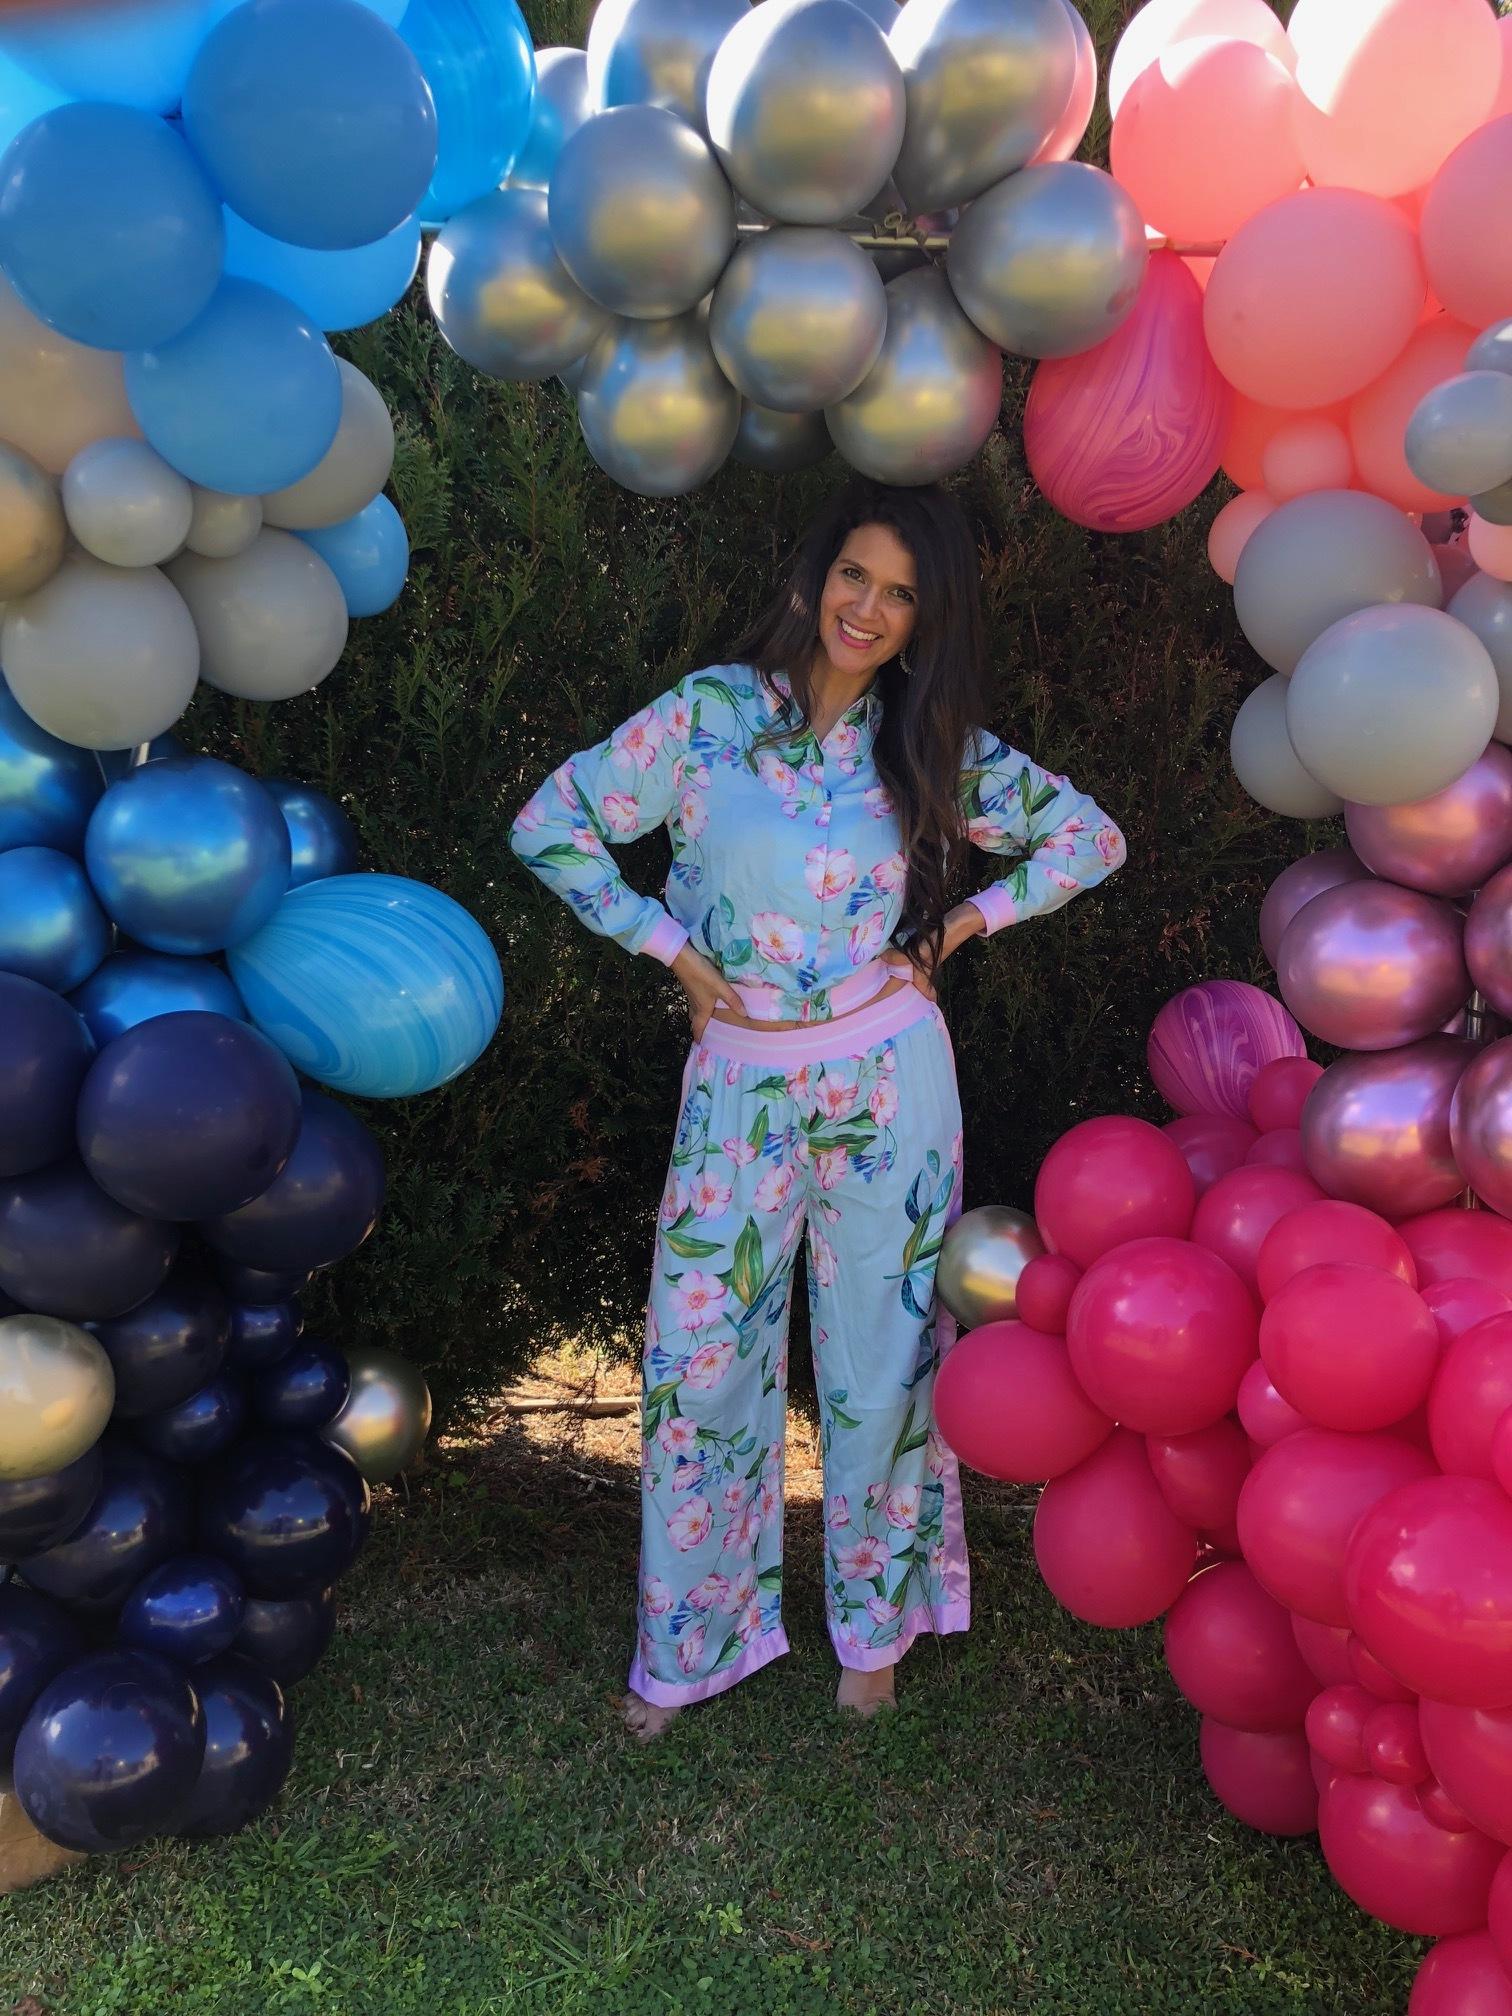 Peter Alexander Aqua Floral Fashion PJ Pant  $79.95 &  Peter Alexander Aqua Floral Jacket  $79.95